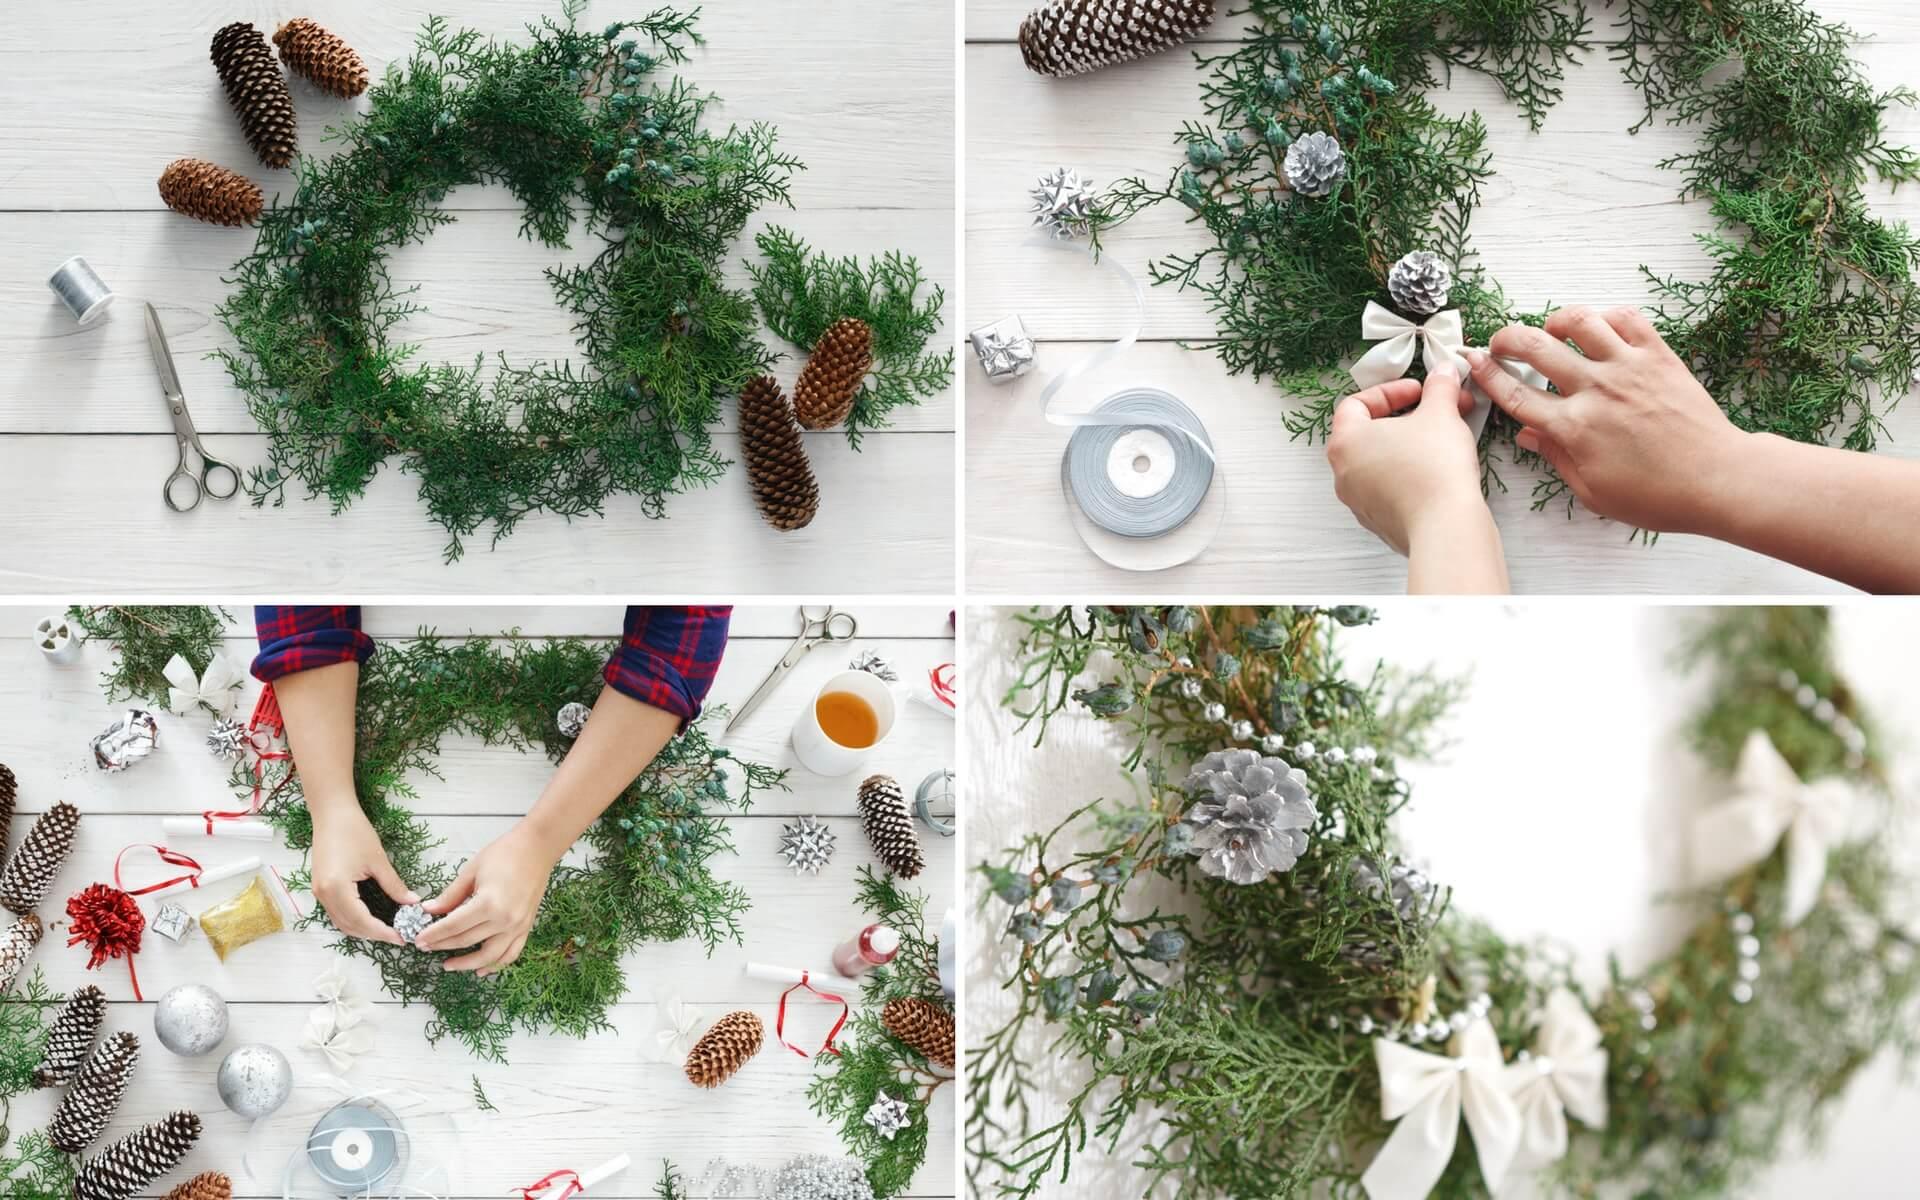 Decorazioni natalizie per porte e finestre blog oknoplast - Ghirlanda di natale per porta ...